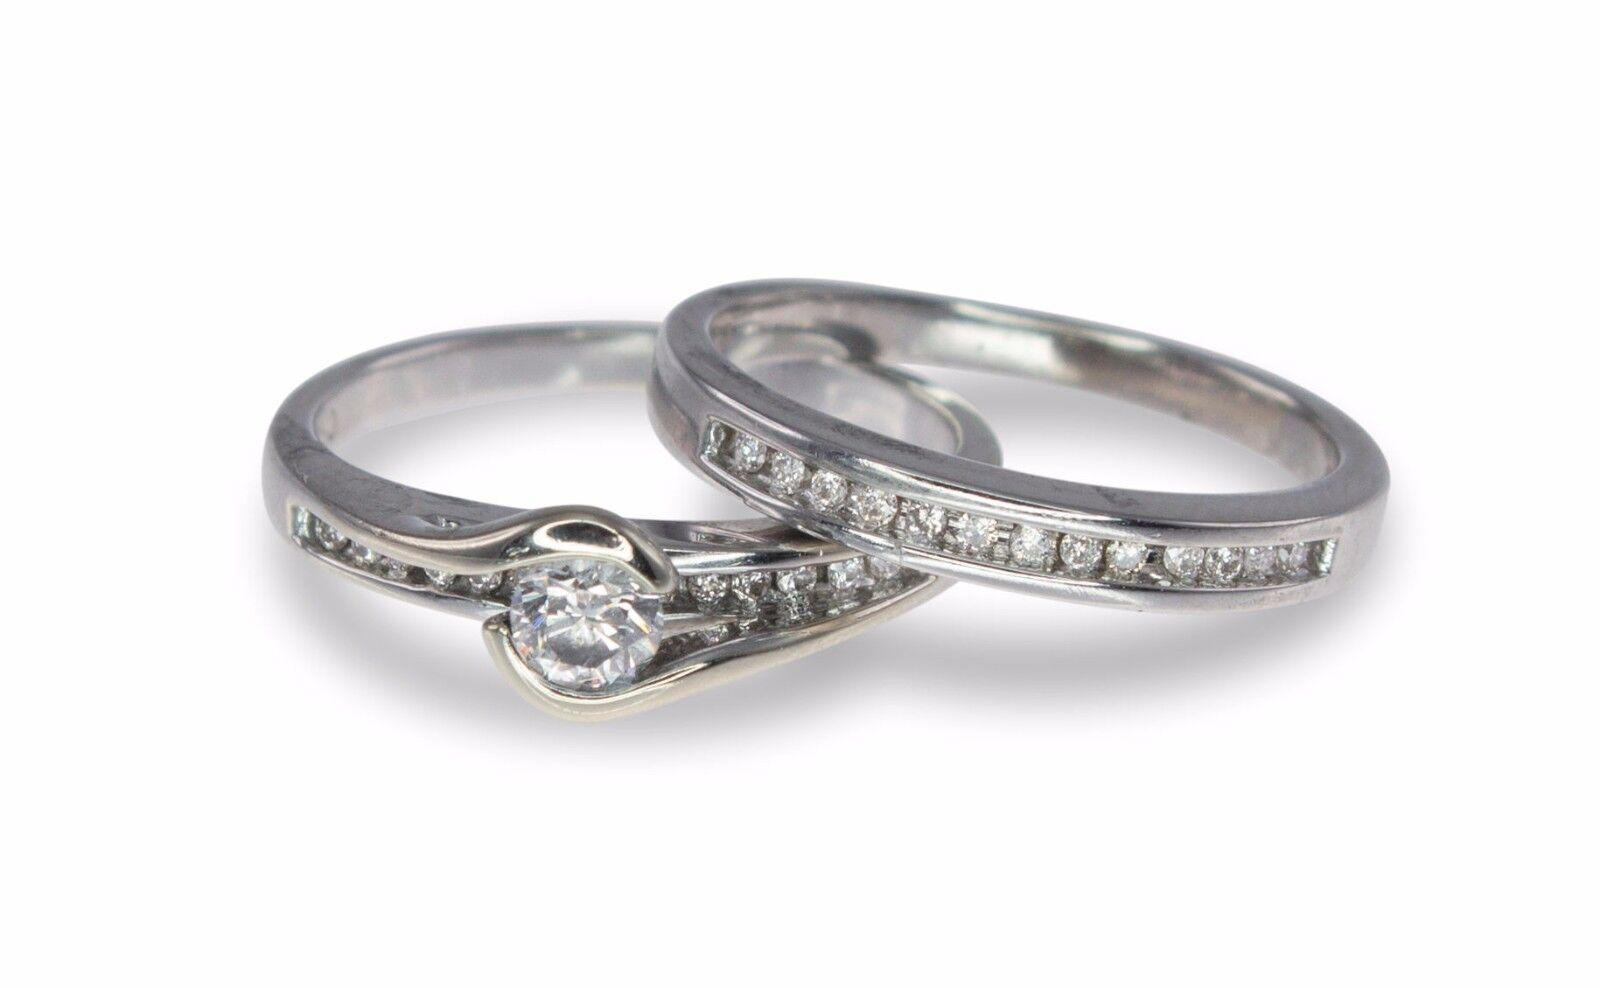 REDUCED 18k White gold .315ct Diamond Engagement Wedd. 2 Ring Bridal Set 595566